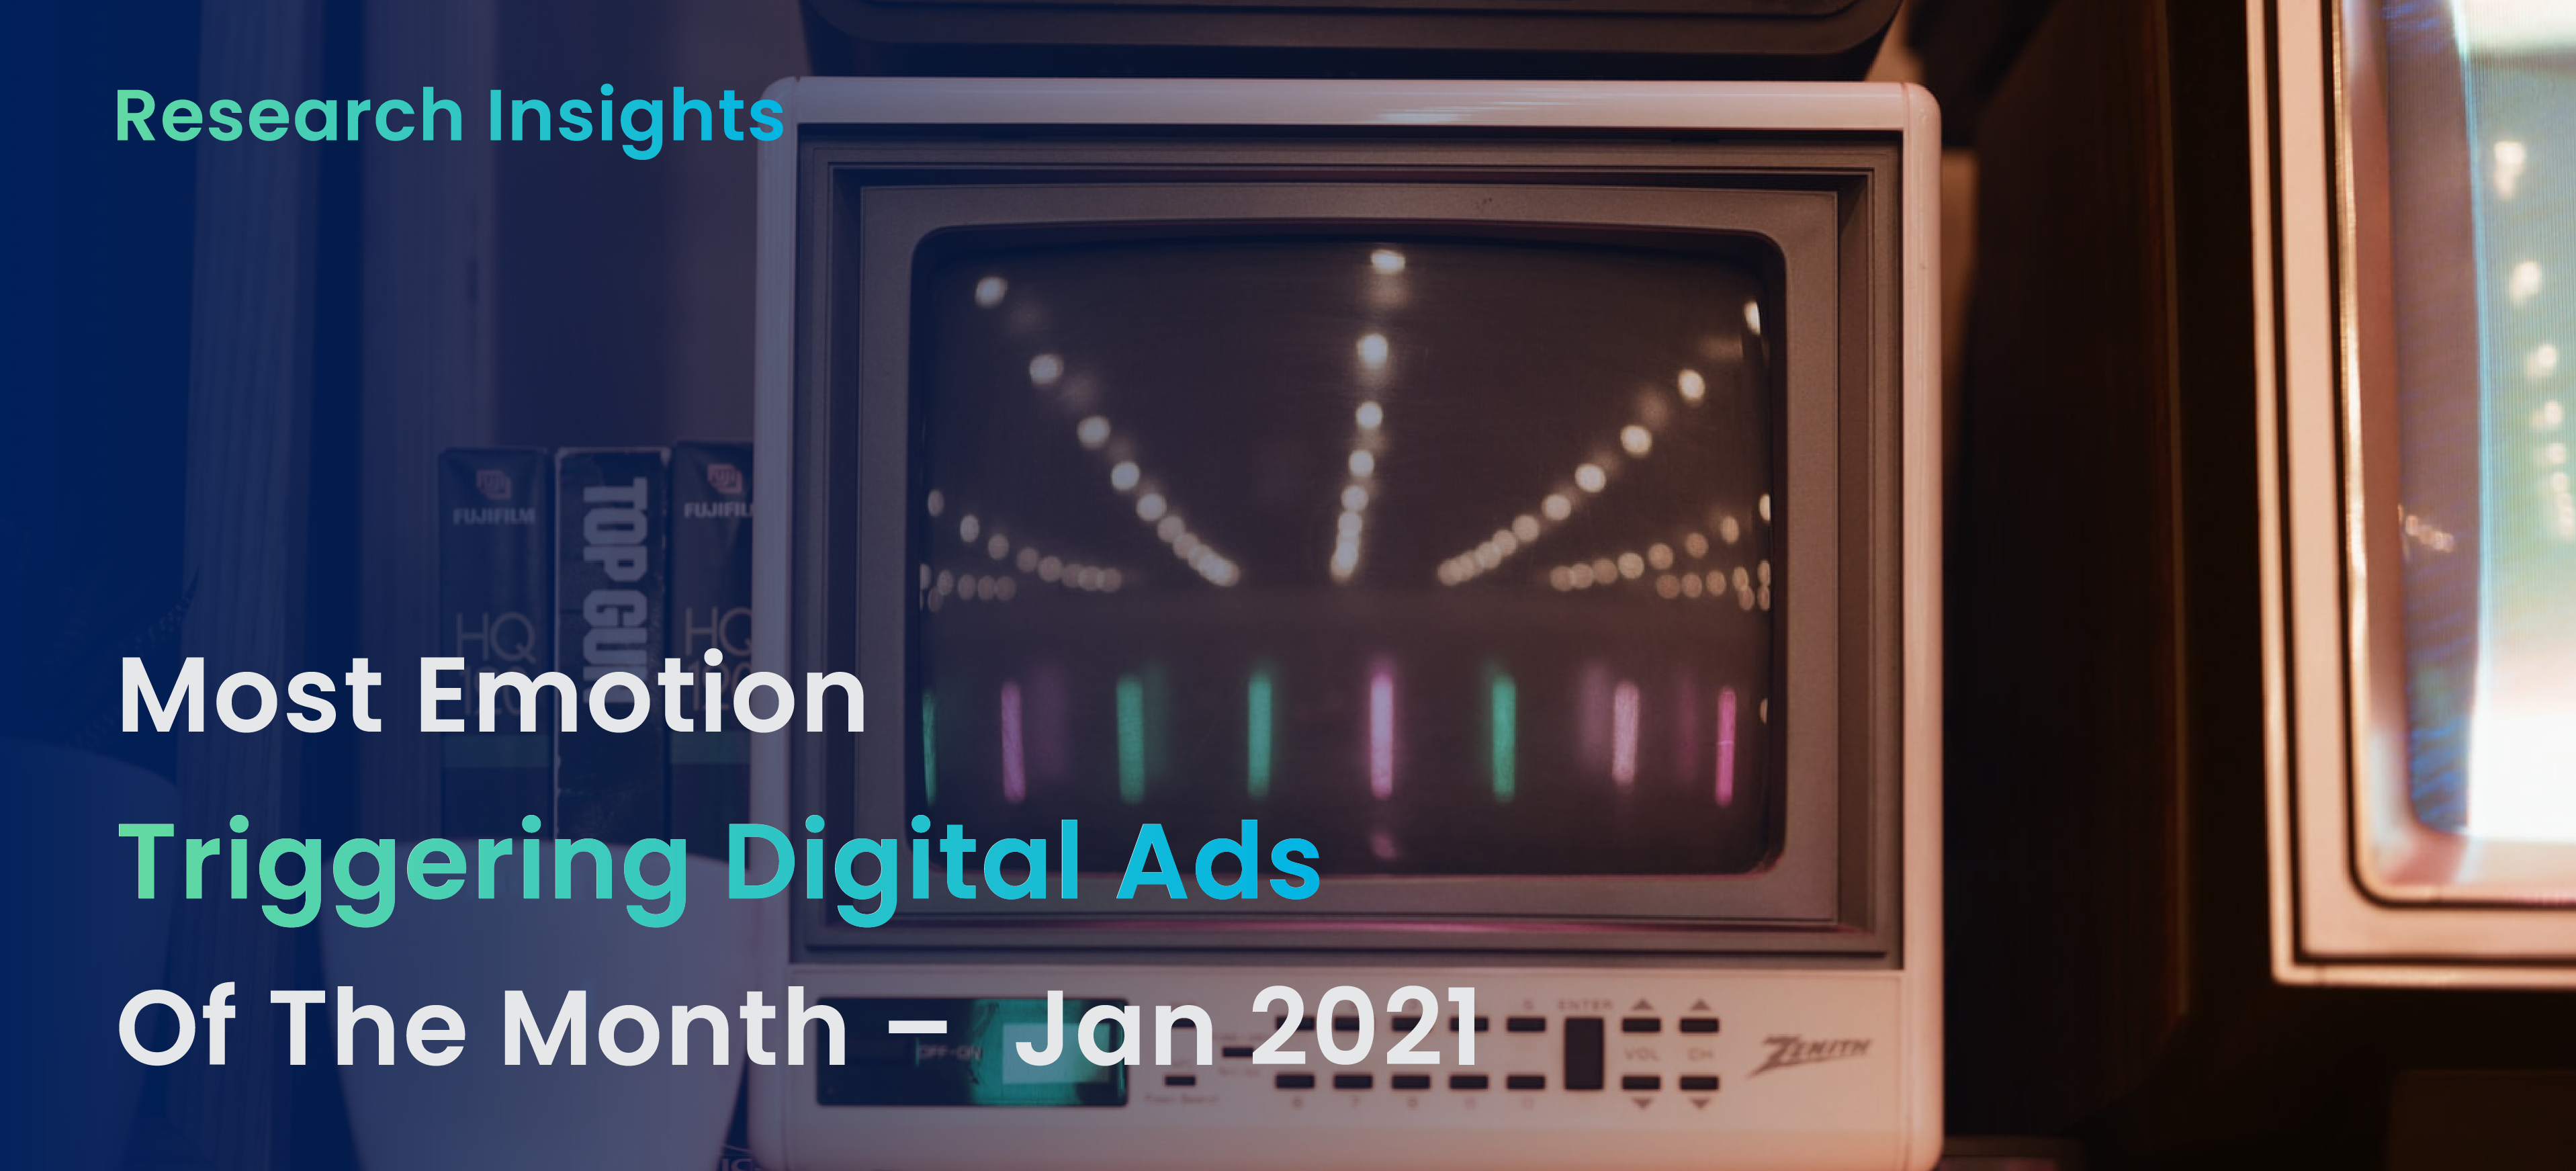 Ad Insights For Most Emotion Triggering Digital Ads – Jan 2021